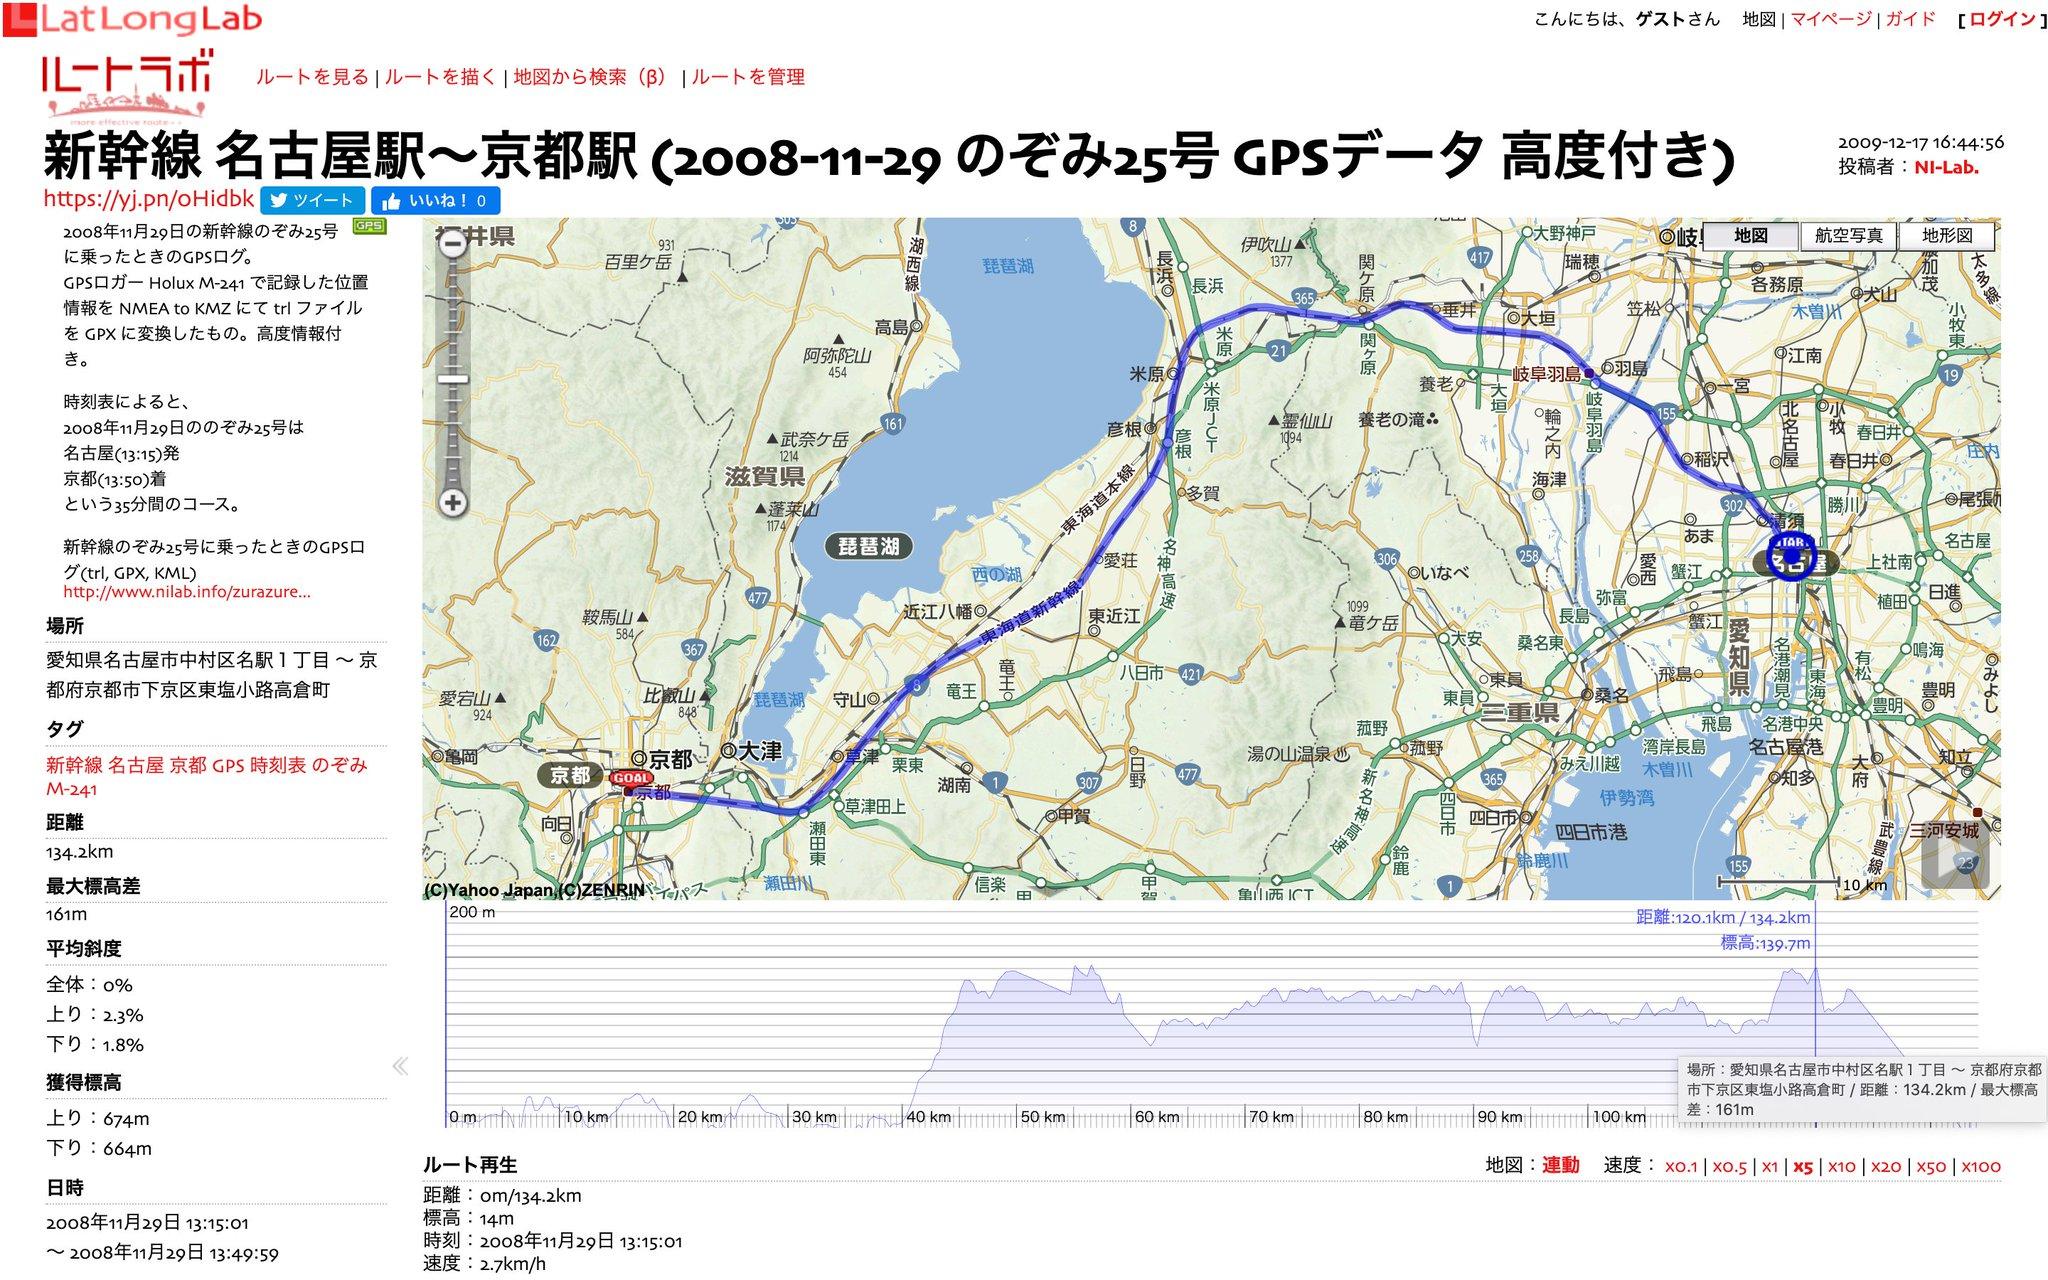 「GPSロガー Holux M-241 で記録した位置情報を NMEA to KMZ にて trl ファイルを GPX に変換したもの。高度情報付き」  新幹線 名古屋駅~京都駅 (2008-11-29 のぞみ25号 GPSデータ 高度付き) - ルートラボ - LatLongLab https://t.co/X6SUkn74nZ https://t.co/fcN7CxdJc4